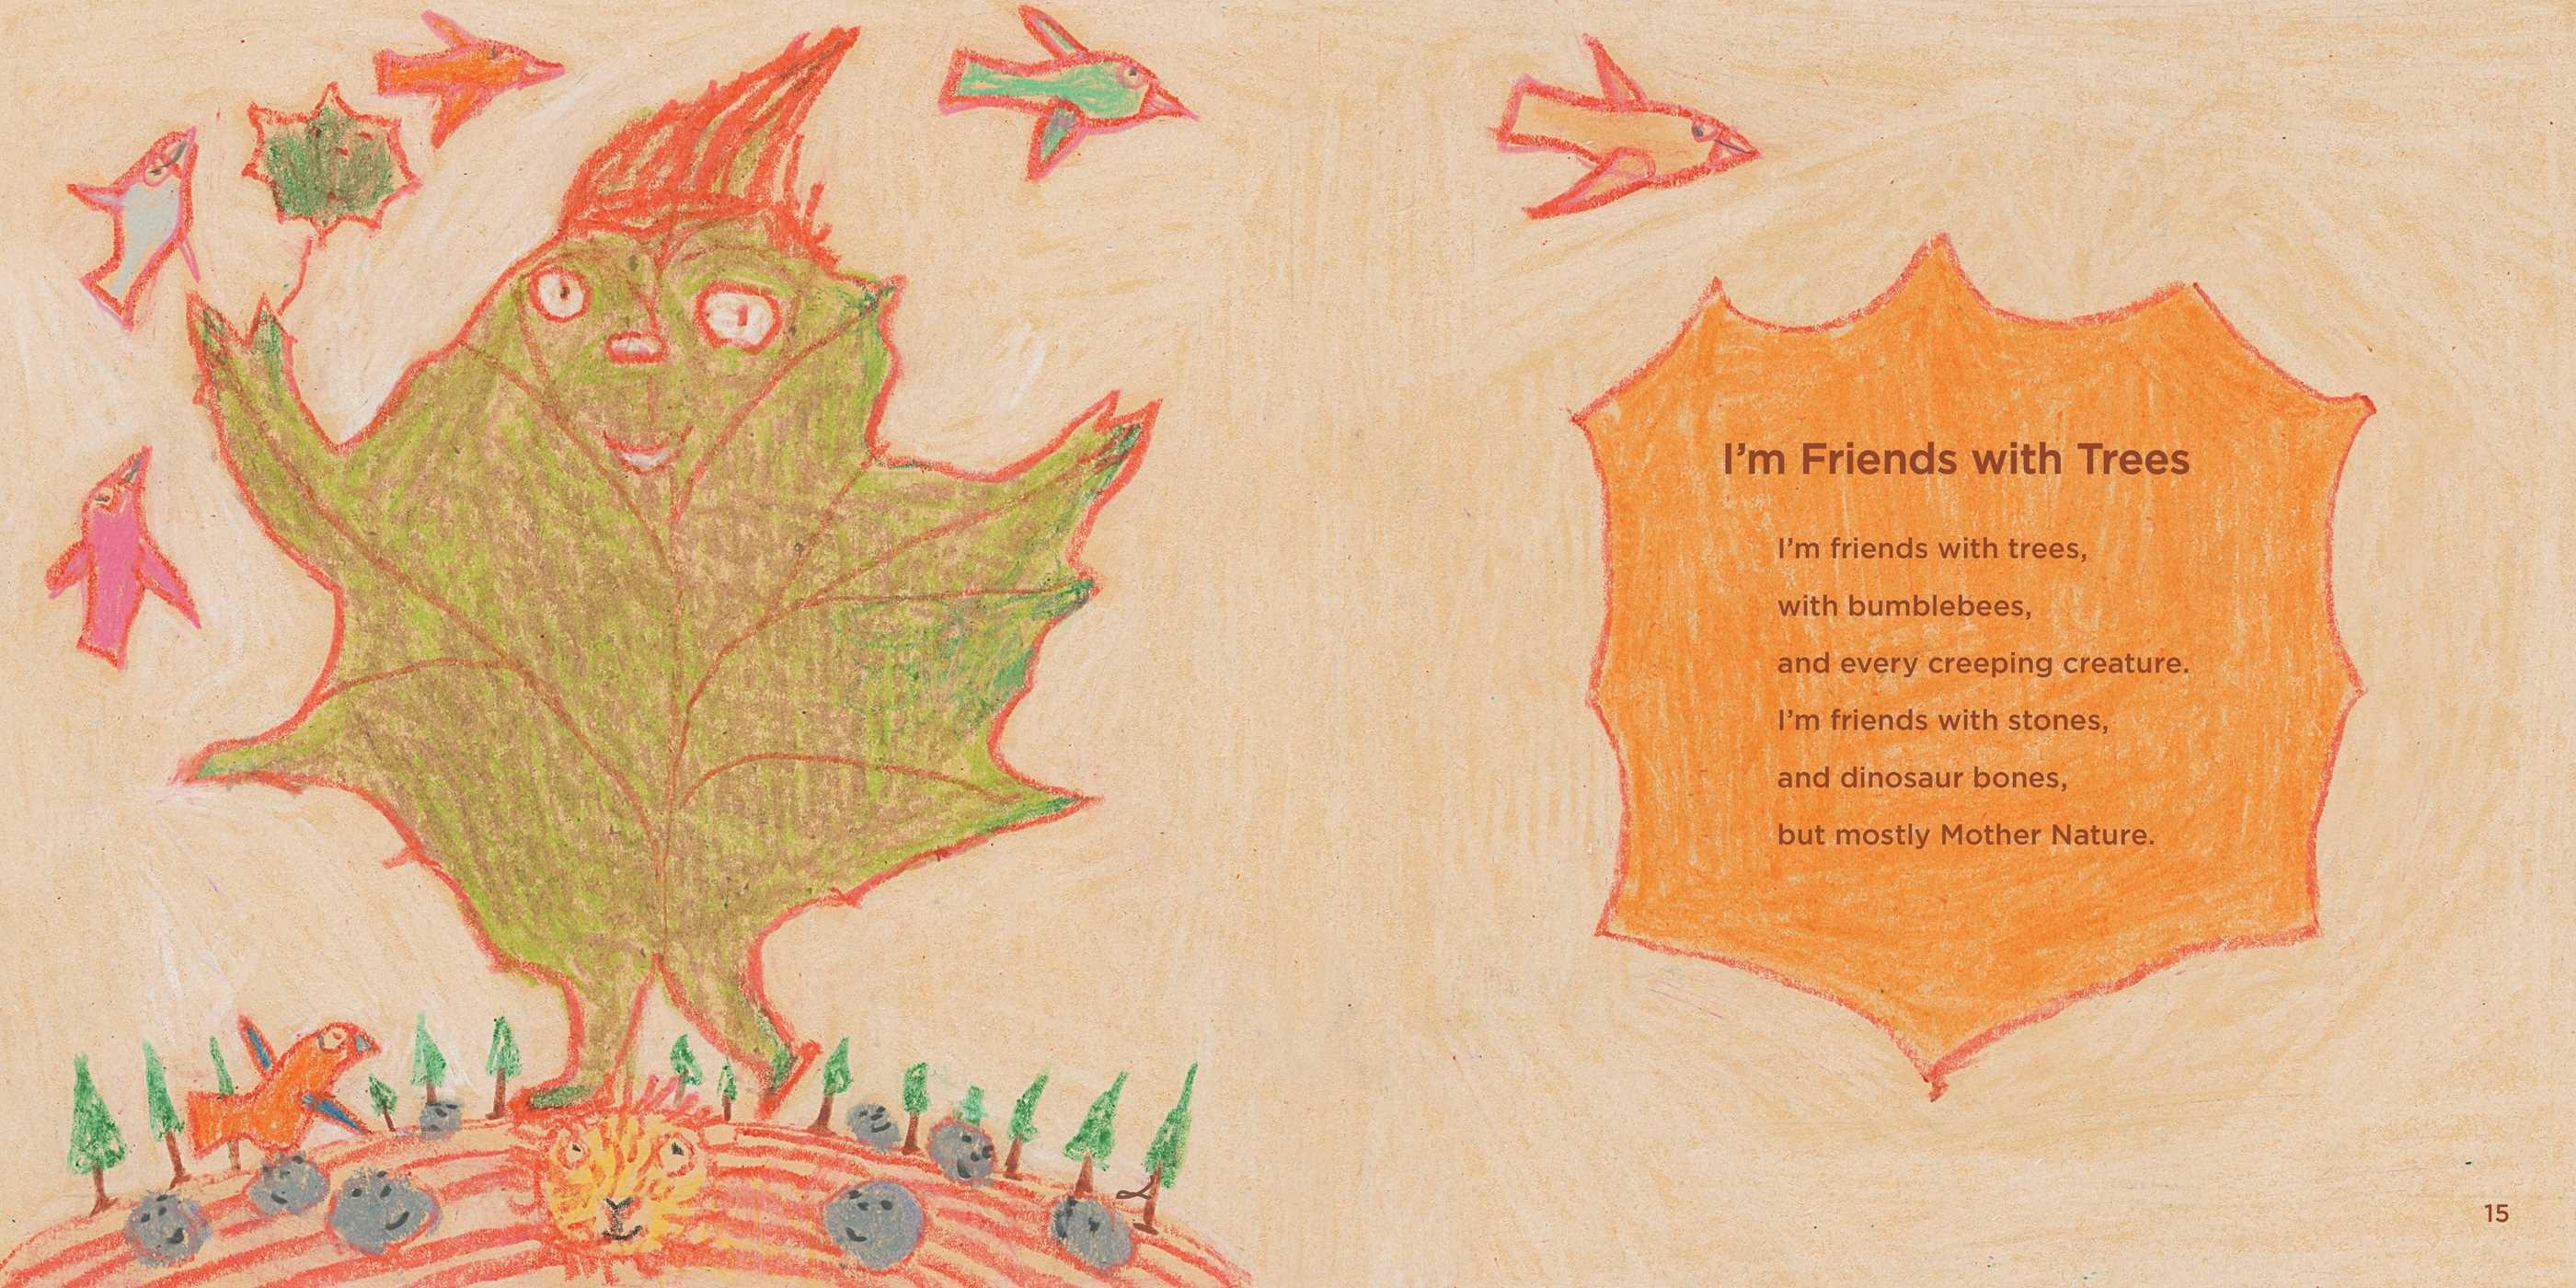 Friends and fiends 9781442487956.in05